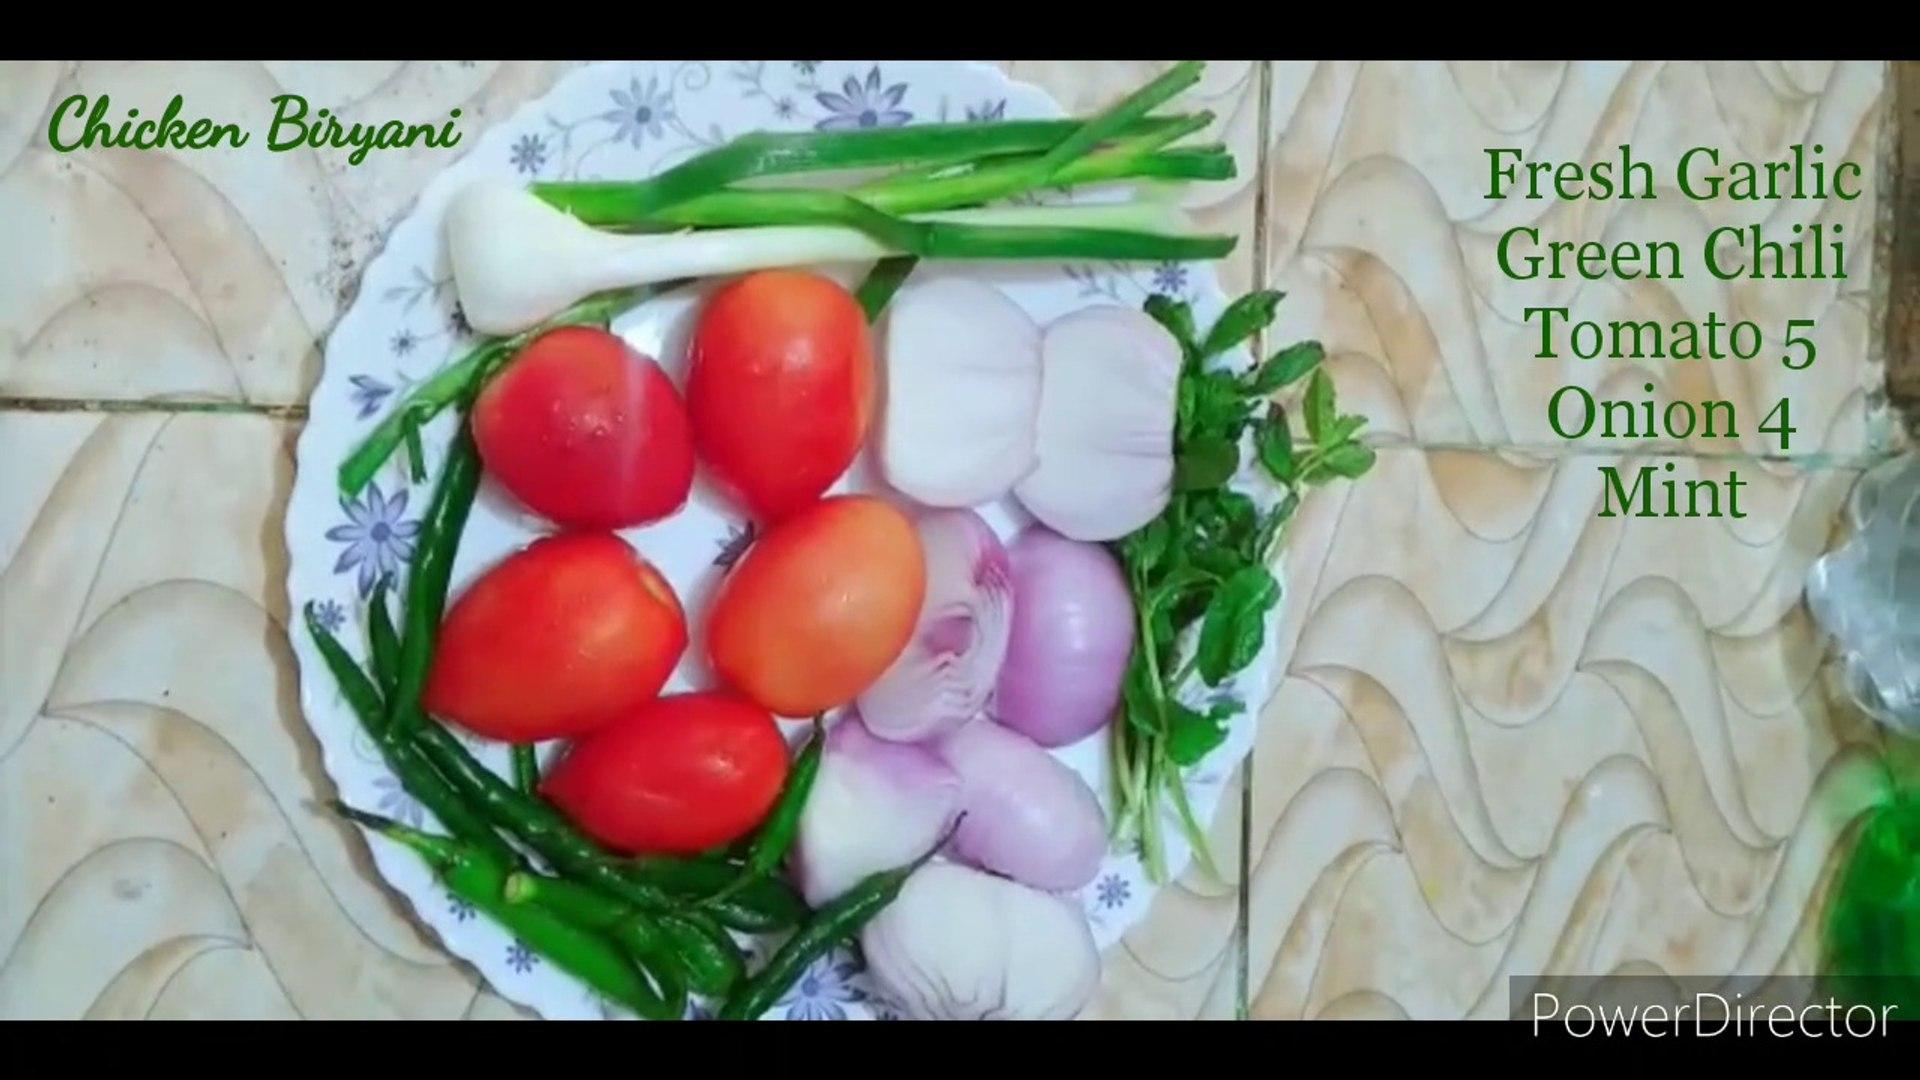 Chicken Biryani Recipe | Chicken Biryani by Zainy's Recipes | Zainy's Recipes